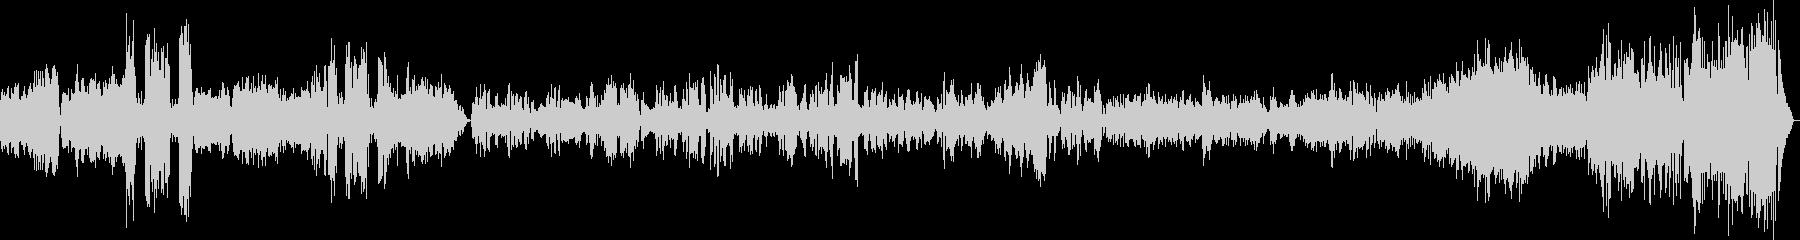 F・リスト:タランテラ(ピアノソロ)の未再生の波形